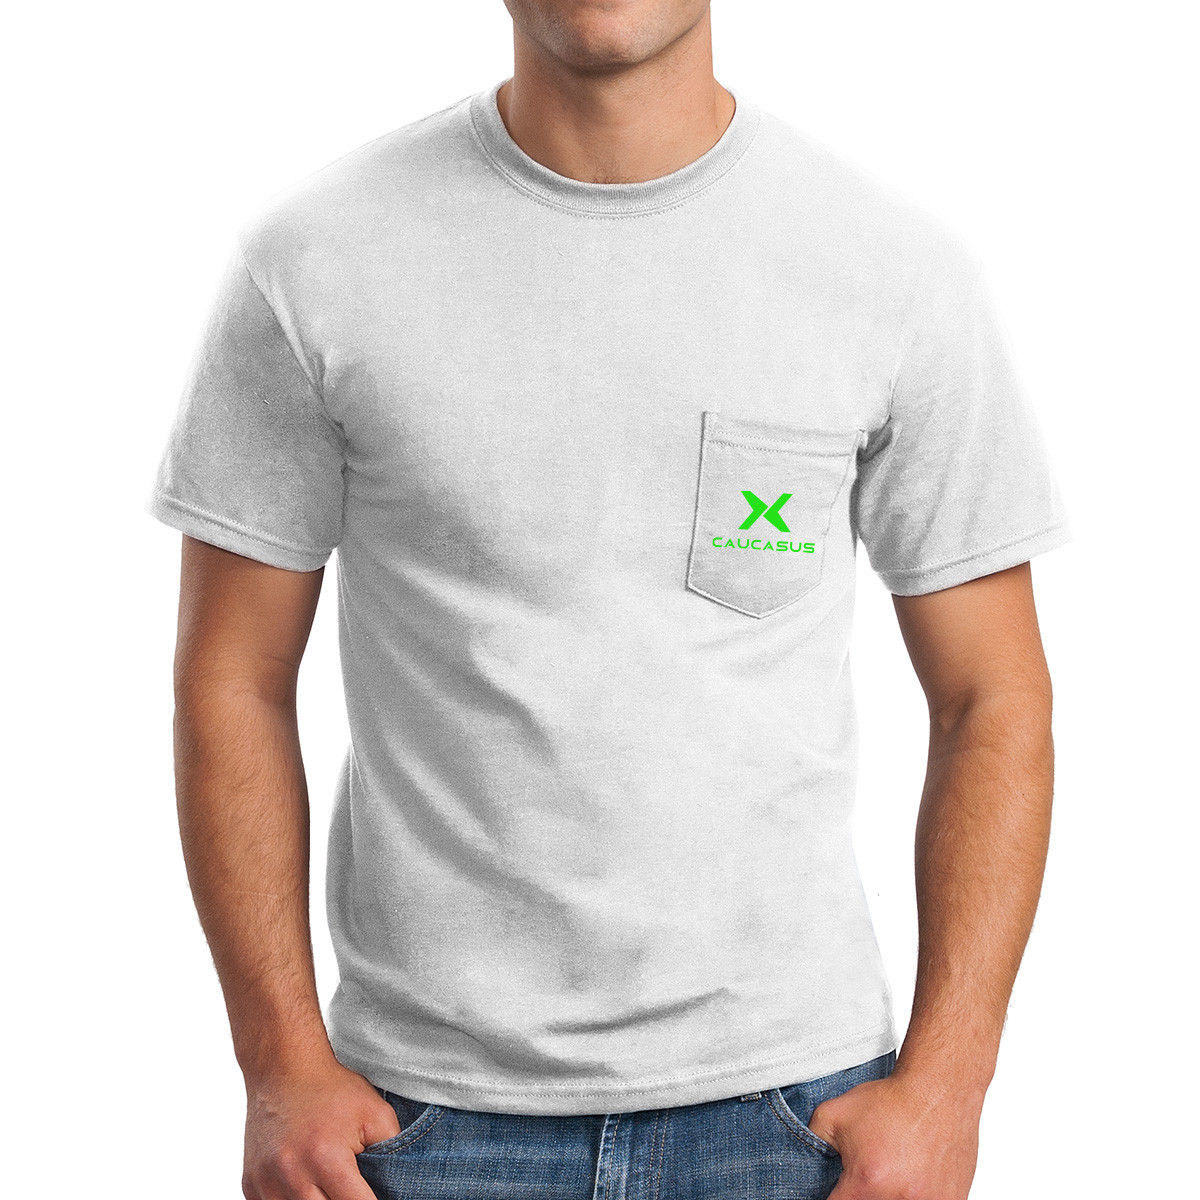 Gildan ® Ultra Cotton ® 100% Cotton T-Shirt with Pocket